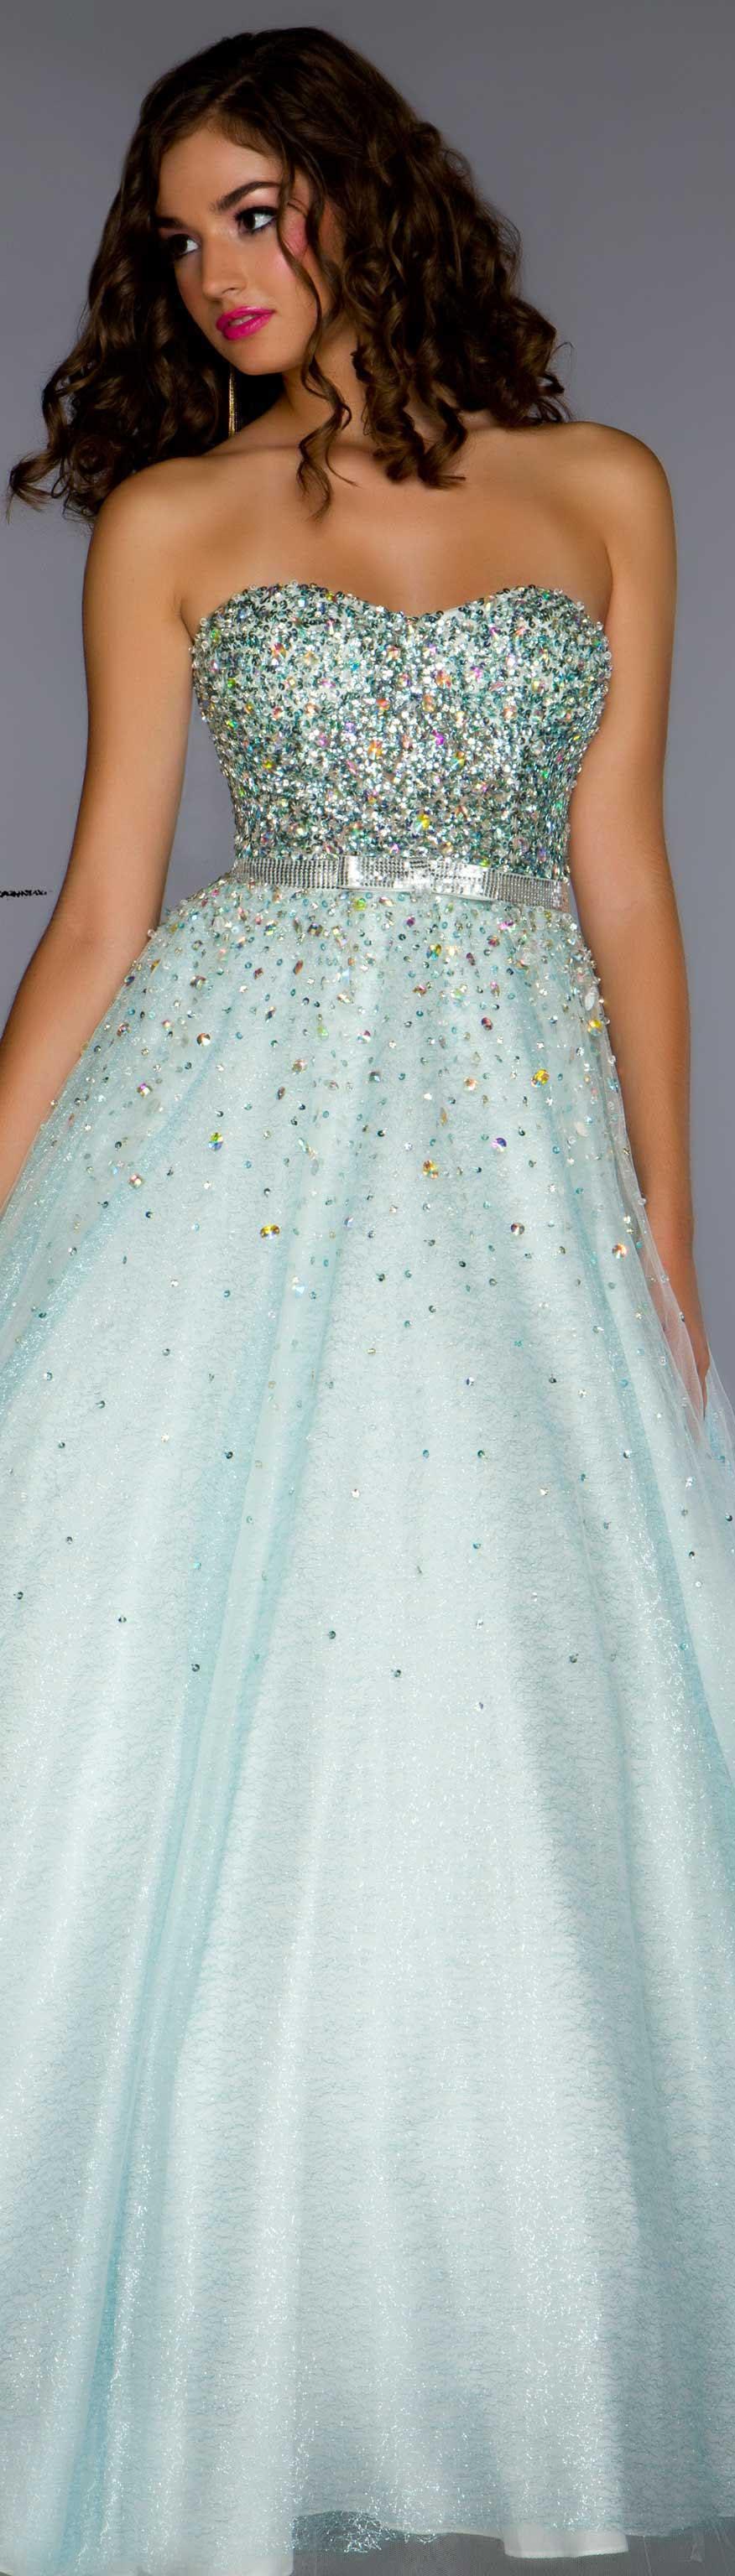 Mac duggal couture dress aqua strapless glitter long formal